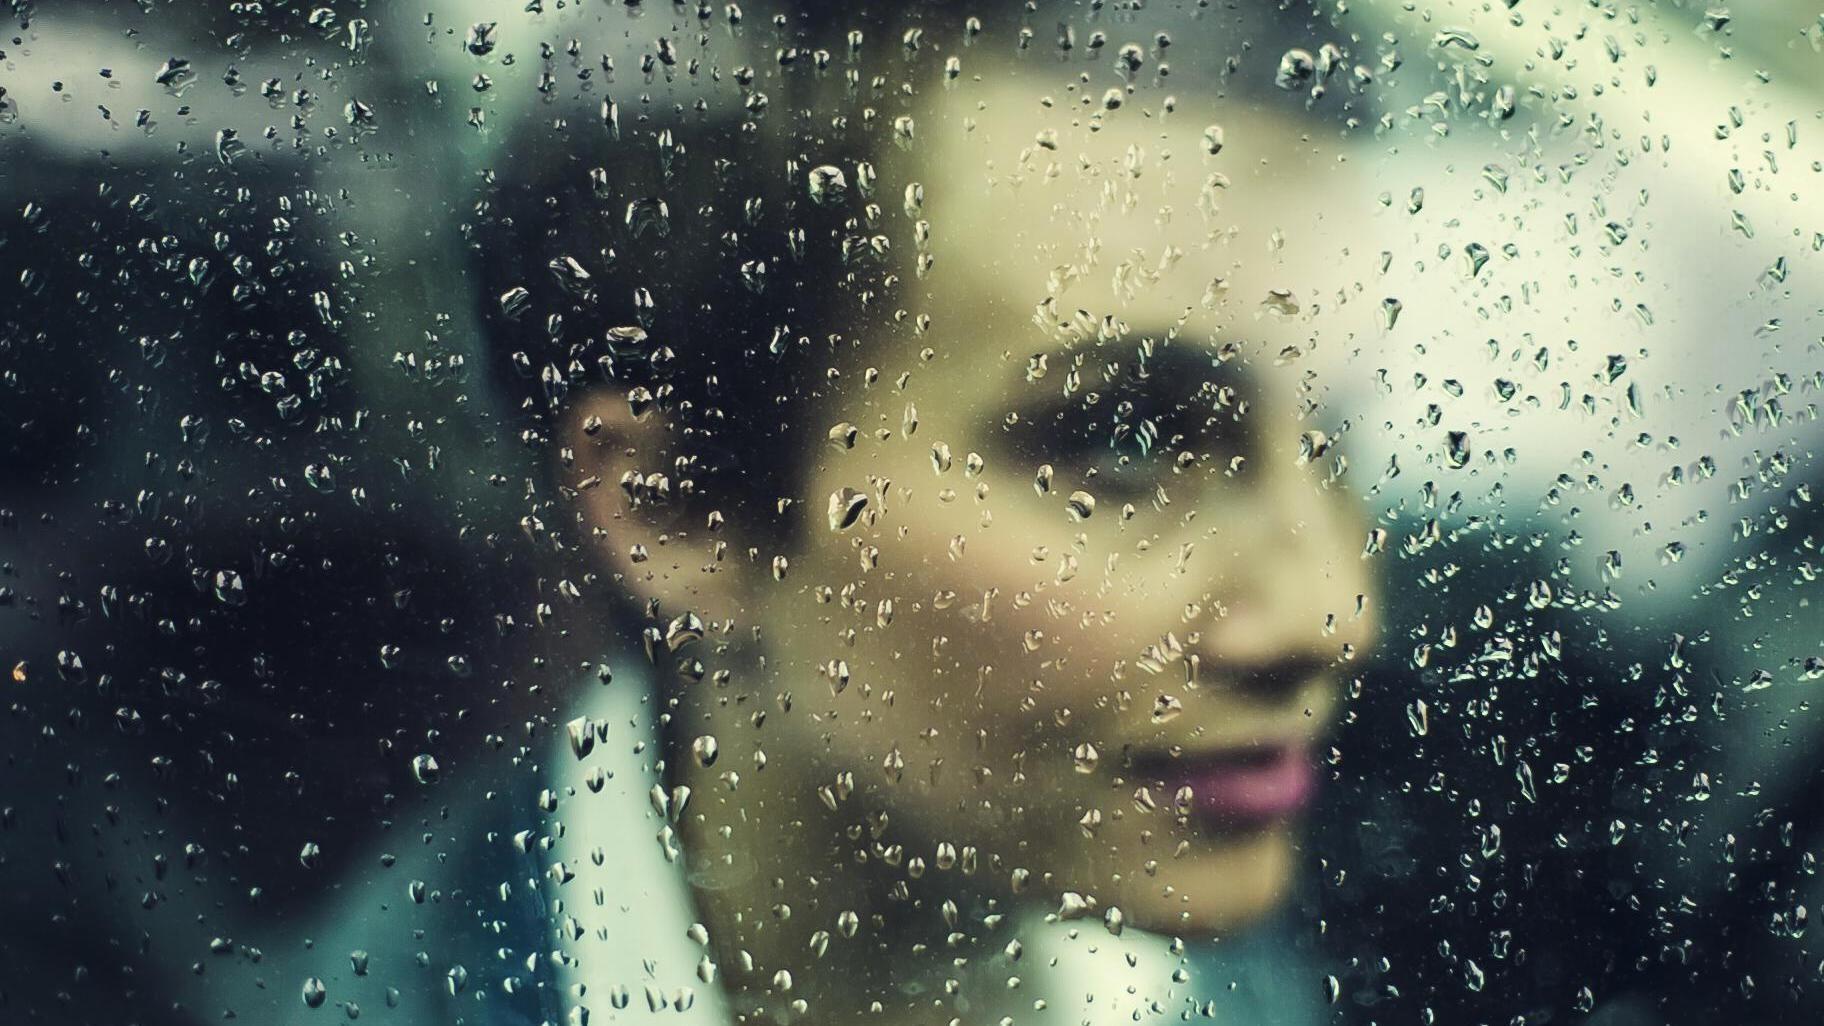 Beautiful Girl Face Hd Wallpaper Free Picture Rain Window Person Woman Beauty Face